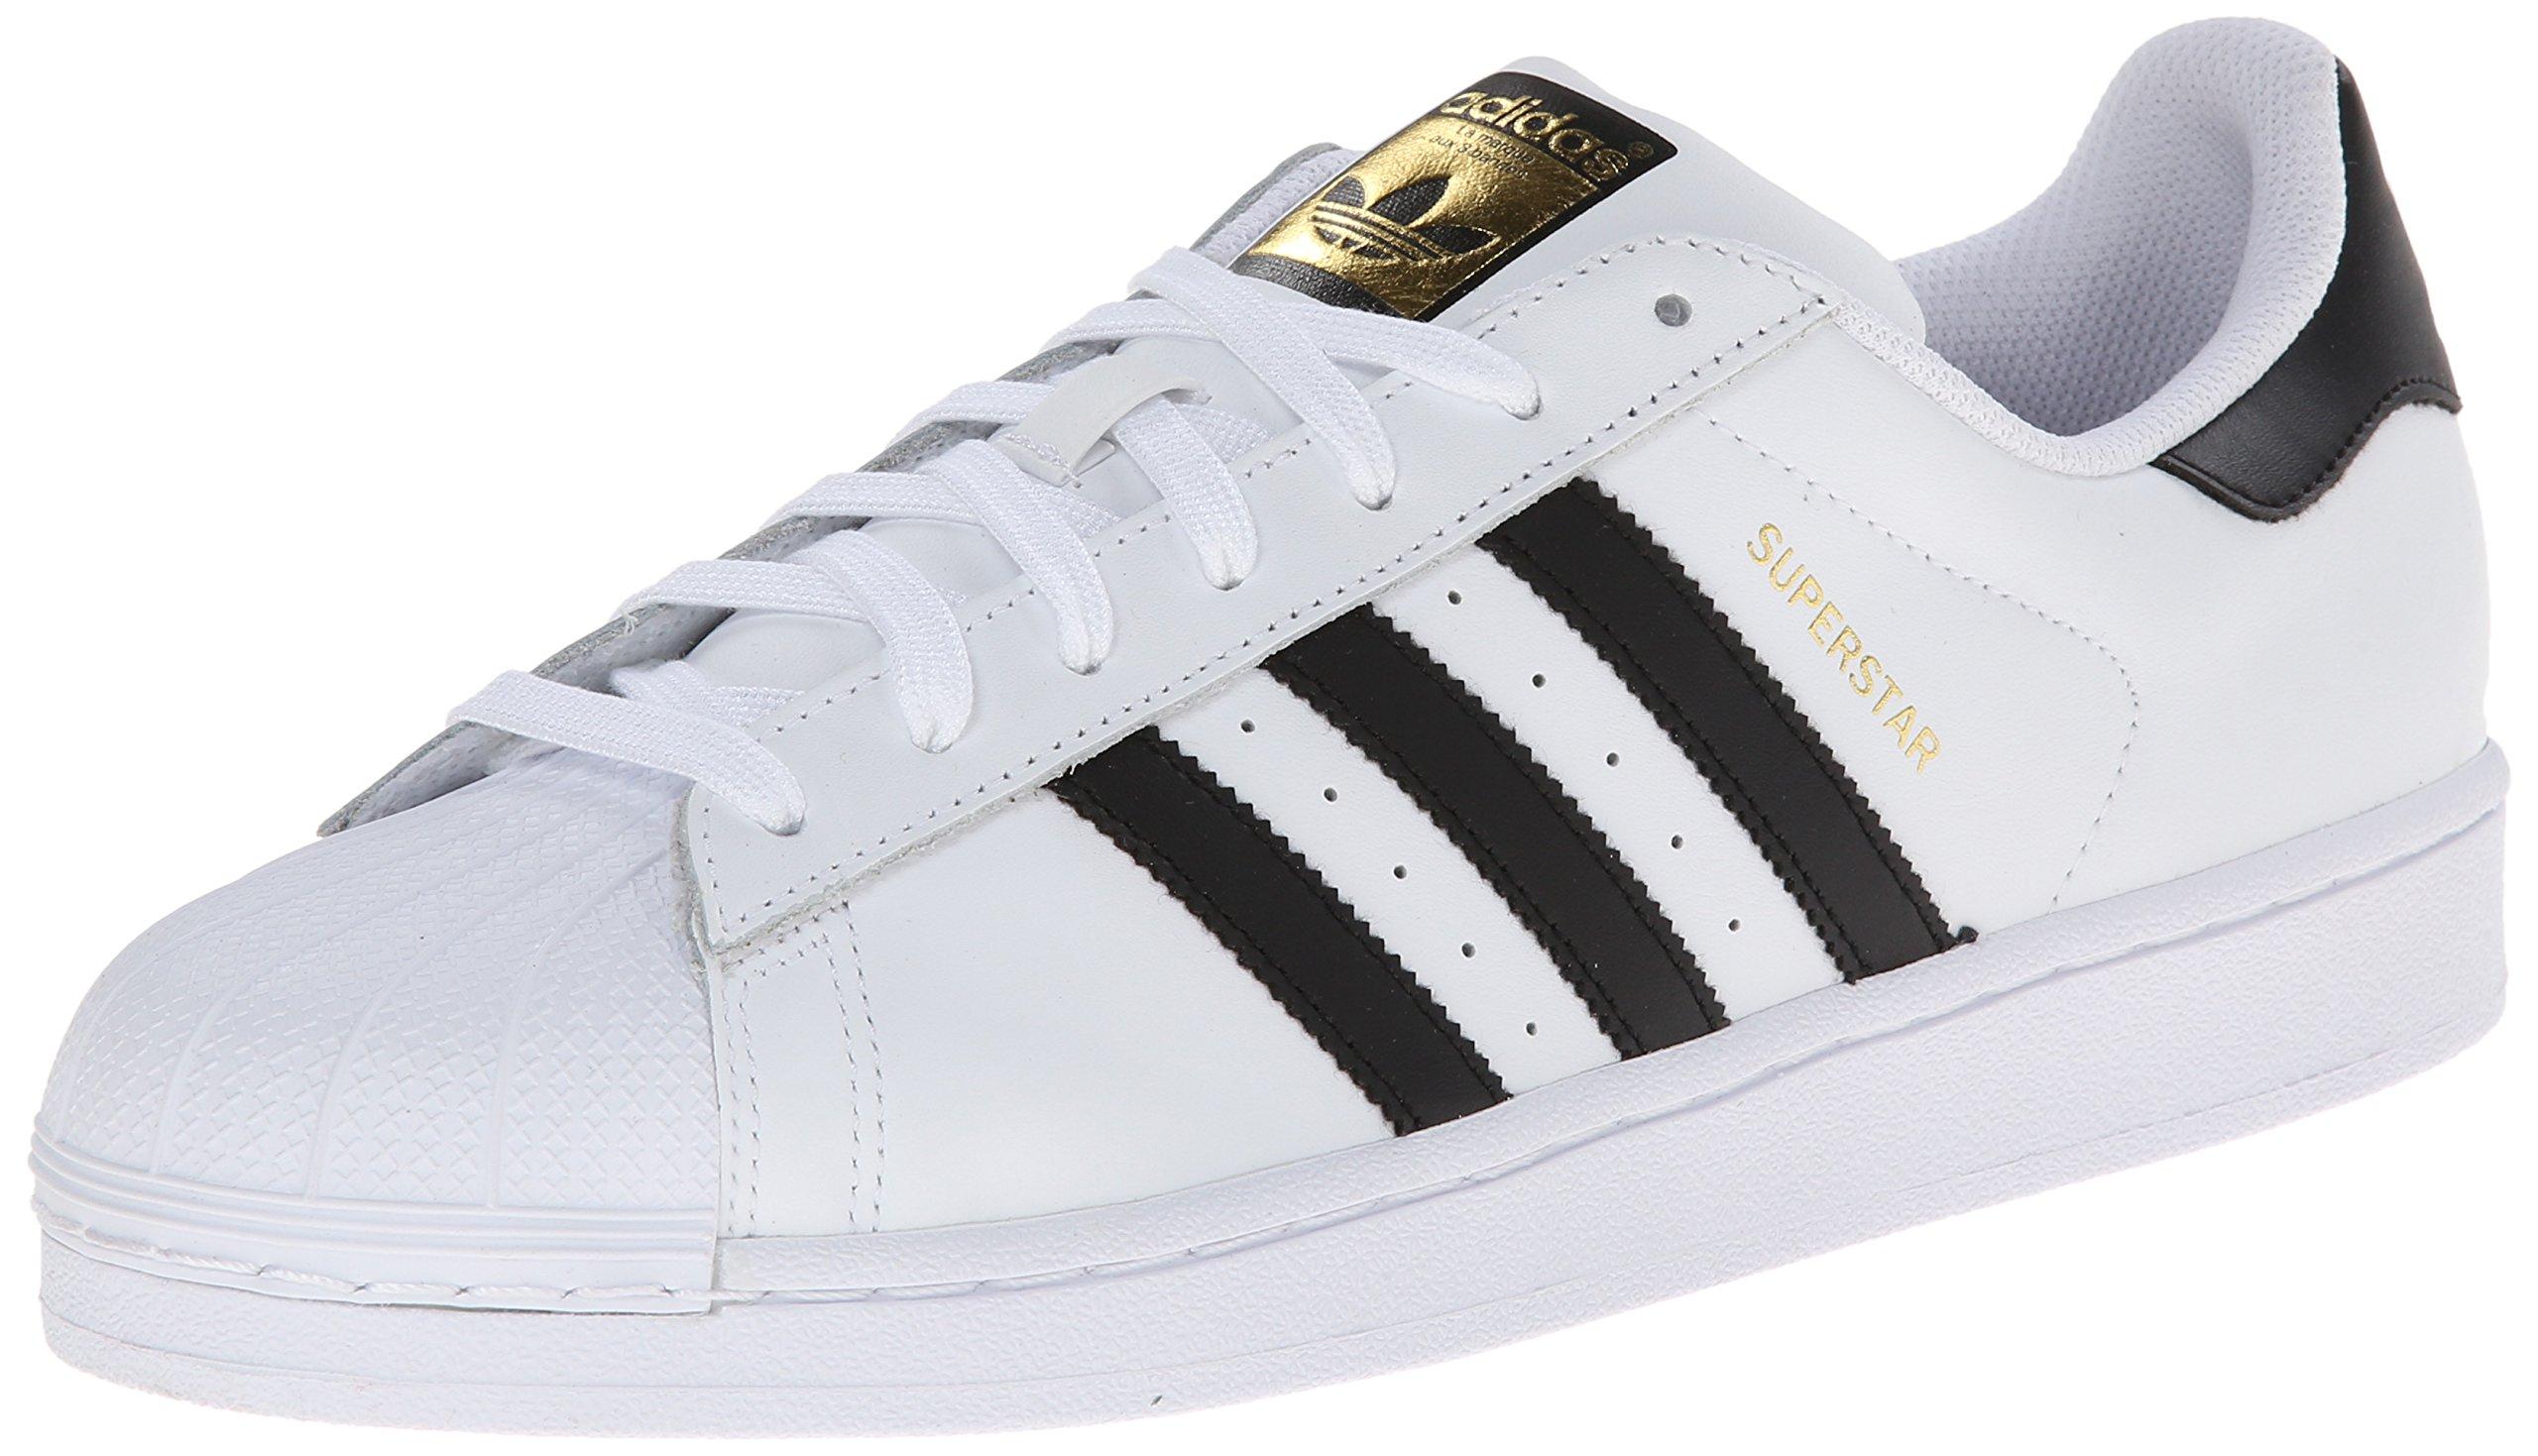 adidas Originals Men's Superstar Shoe Running Core Black/White, 11 M US by adidas Originals